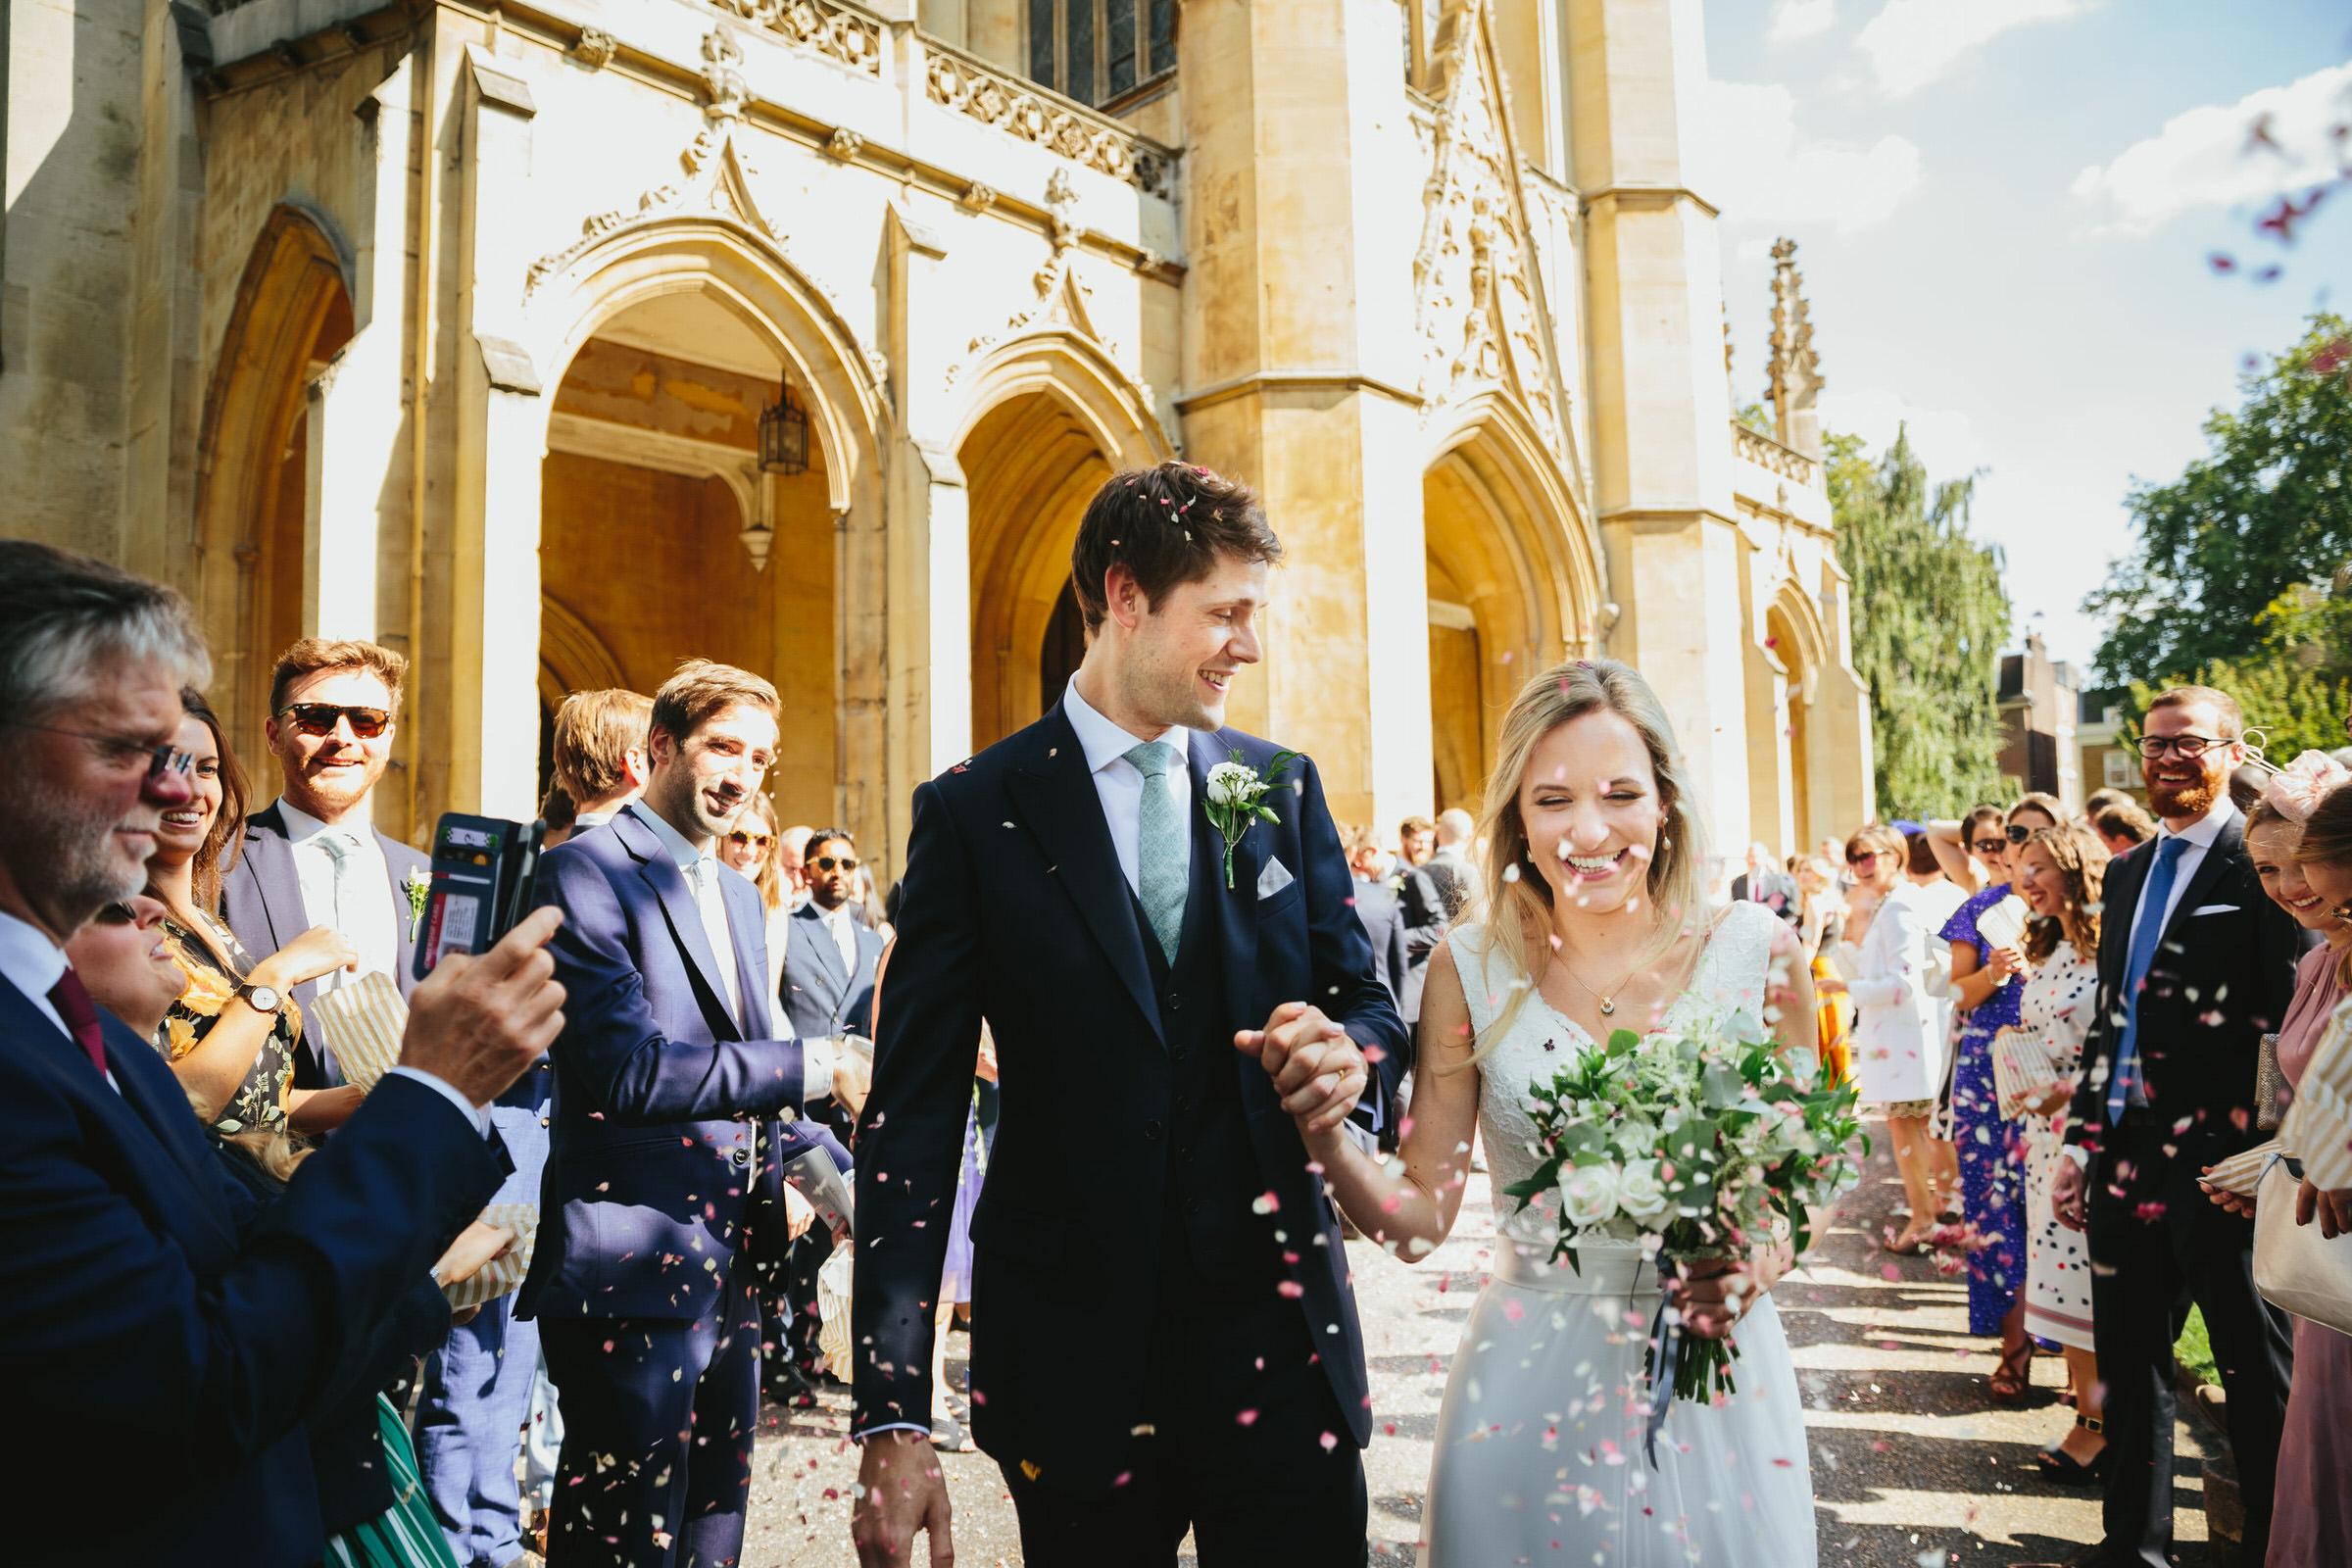 St Lukes Chelsea wedding - Sally & Simon